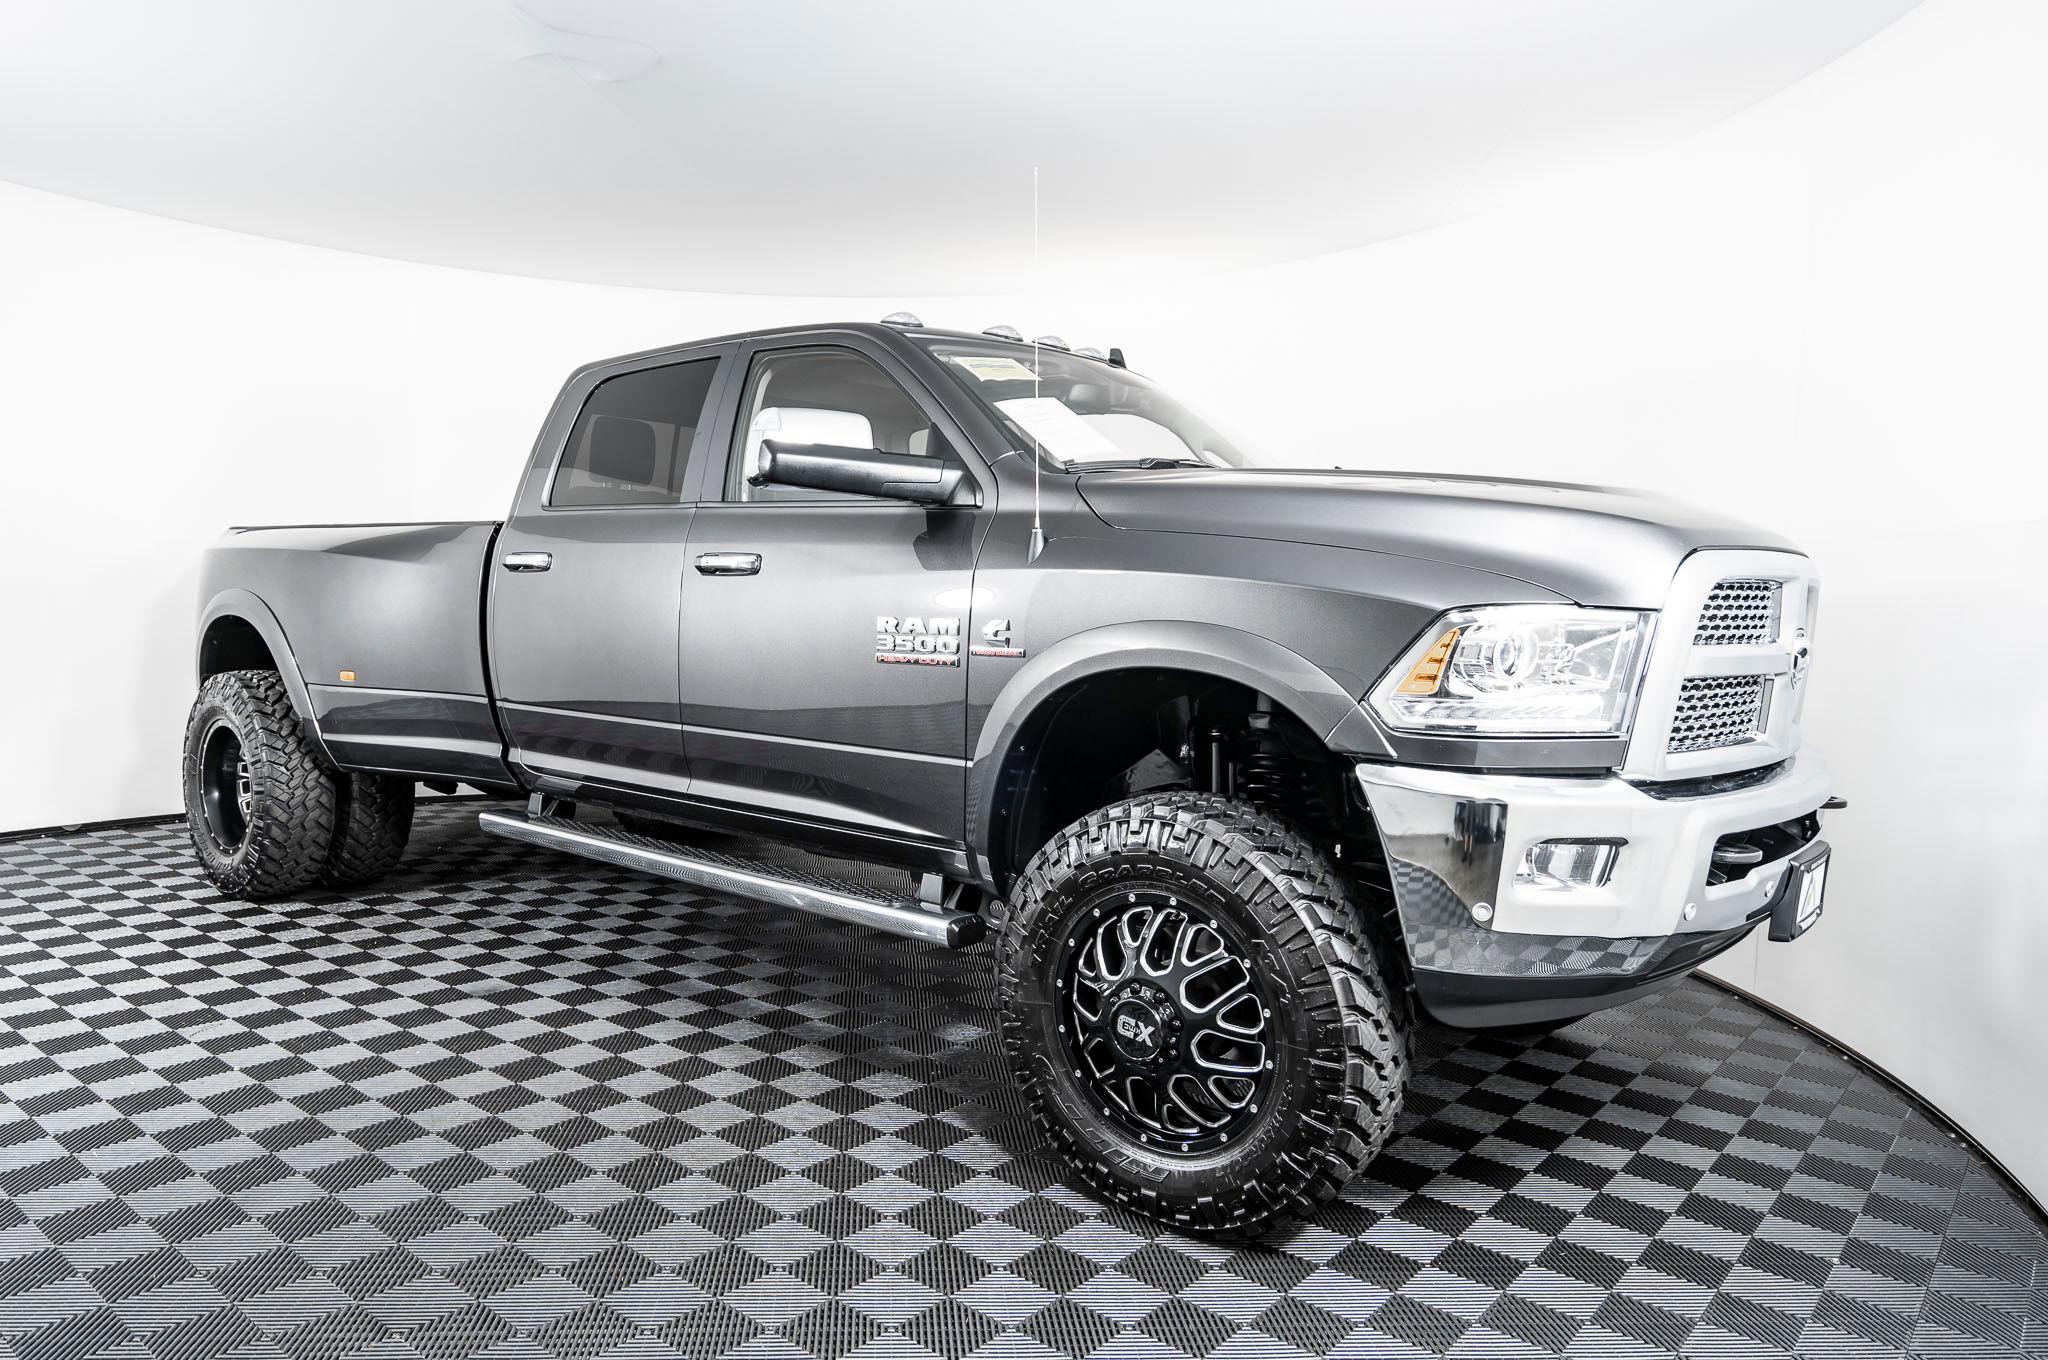 Used Lifted 2018 Dodge Ram 3500 Laramie Dually 4x4 Diesel Truck For Sale Northwest Motorsport